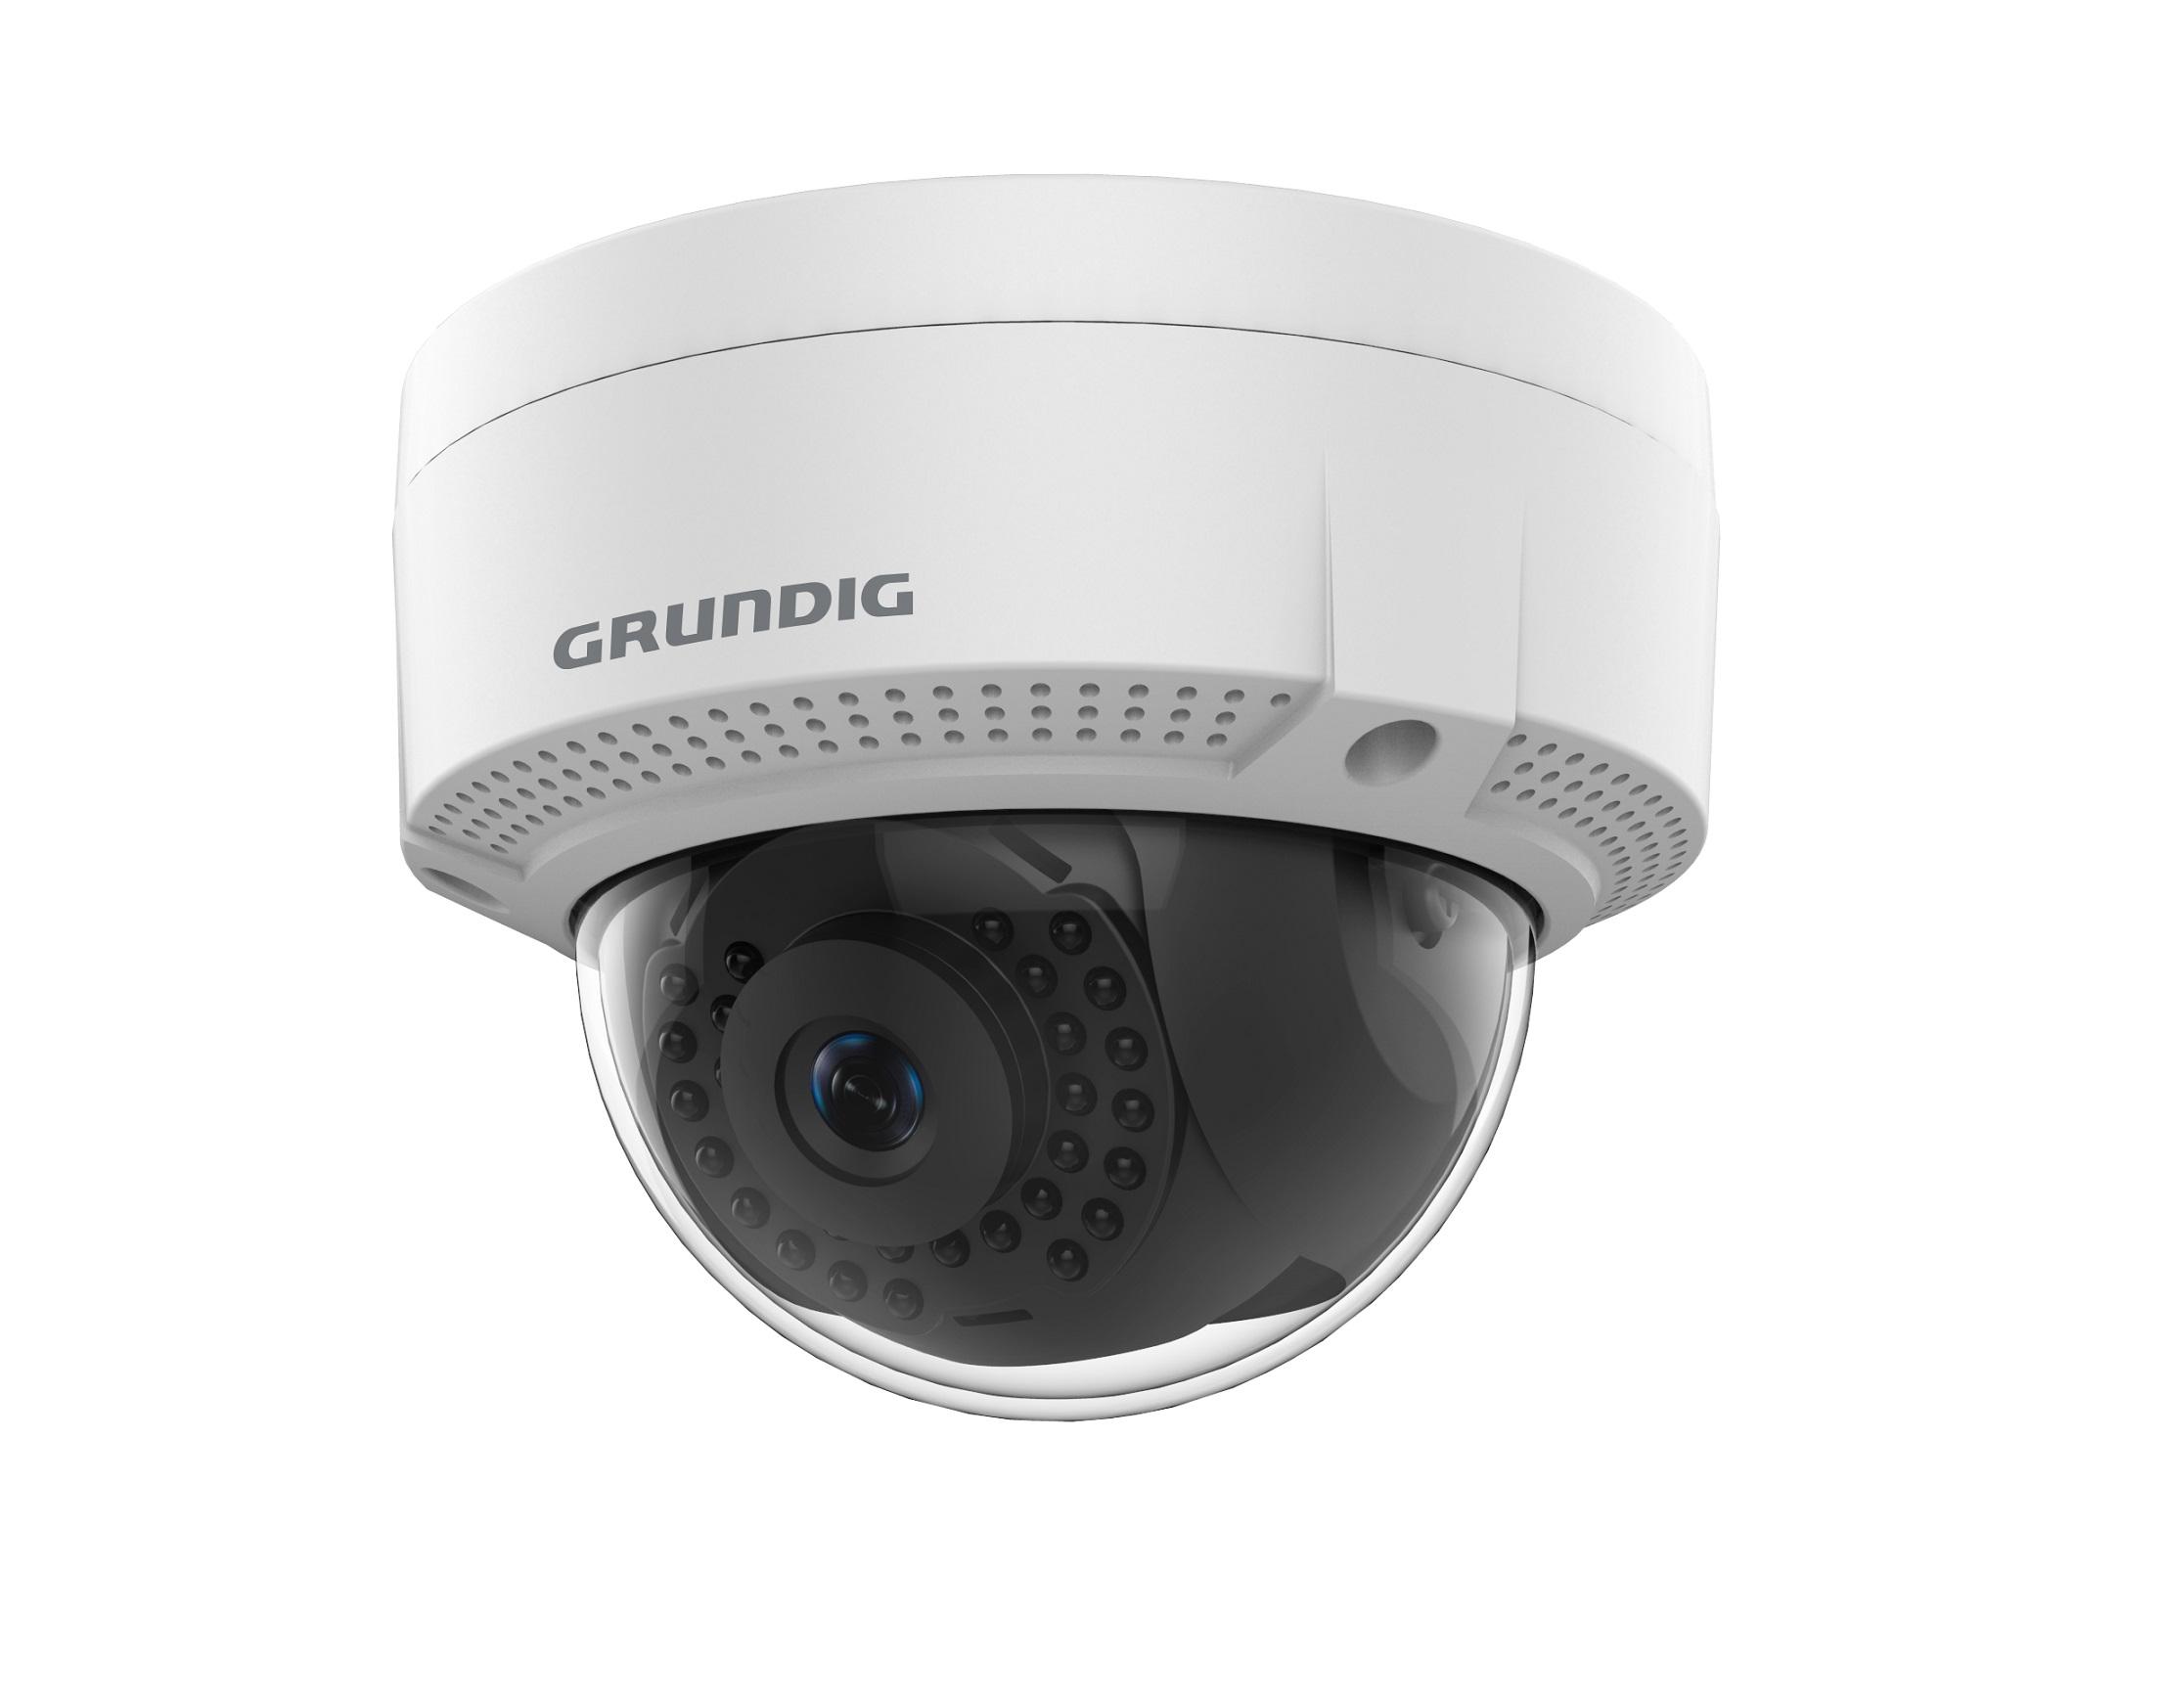 grundig-fix-dome-ip-cctv-camera